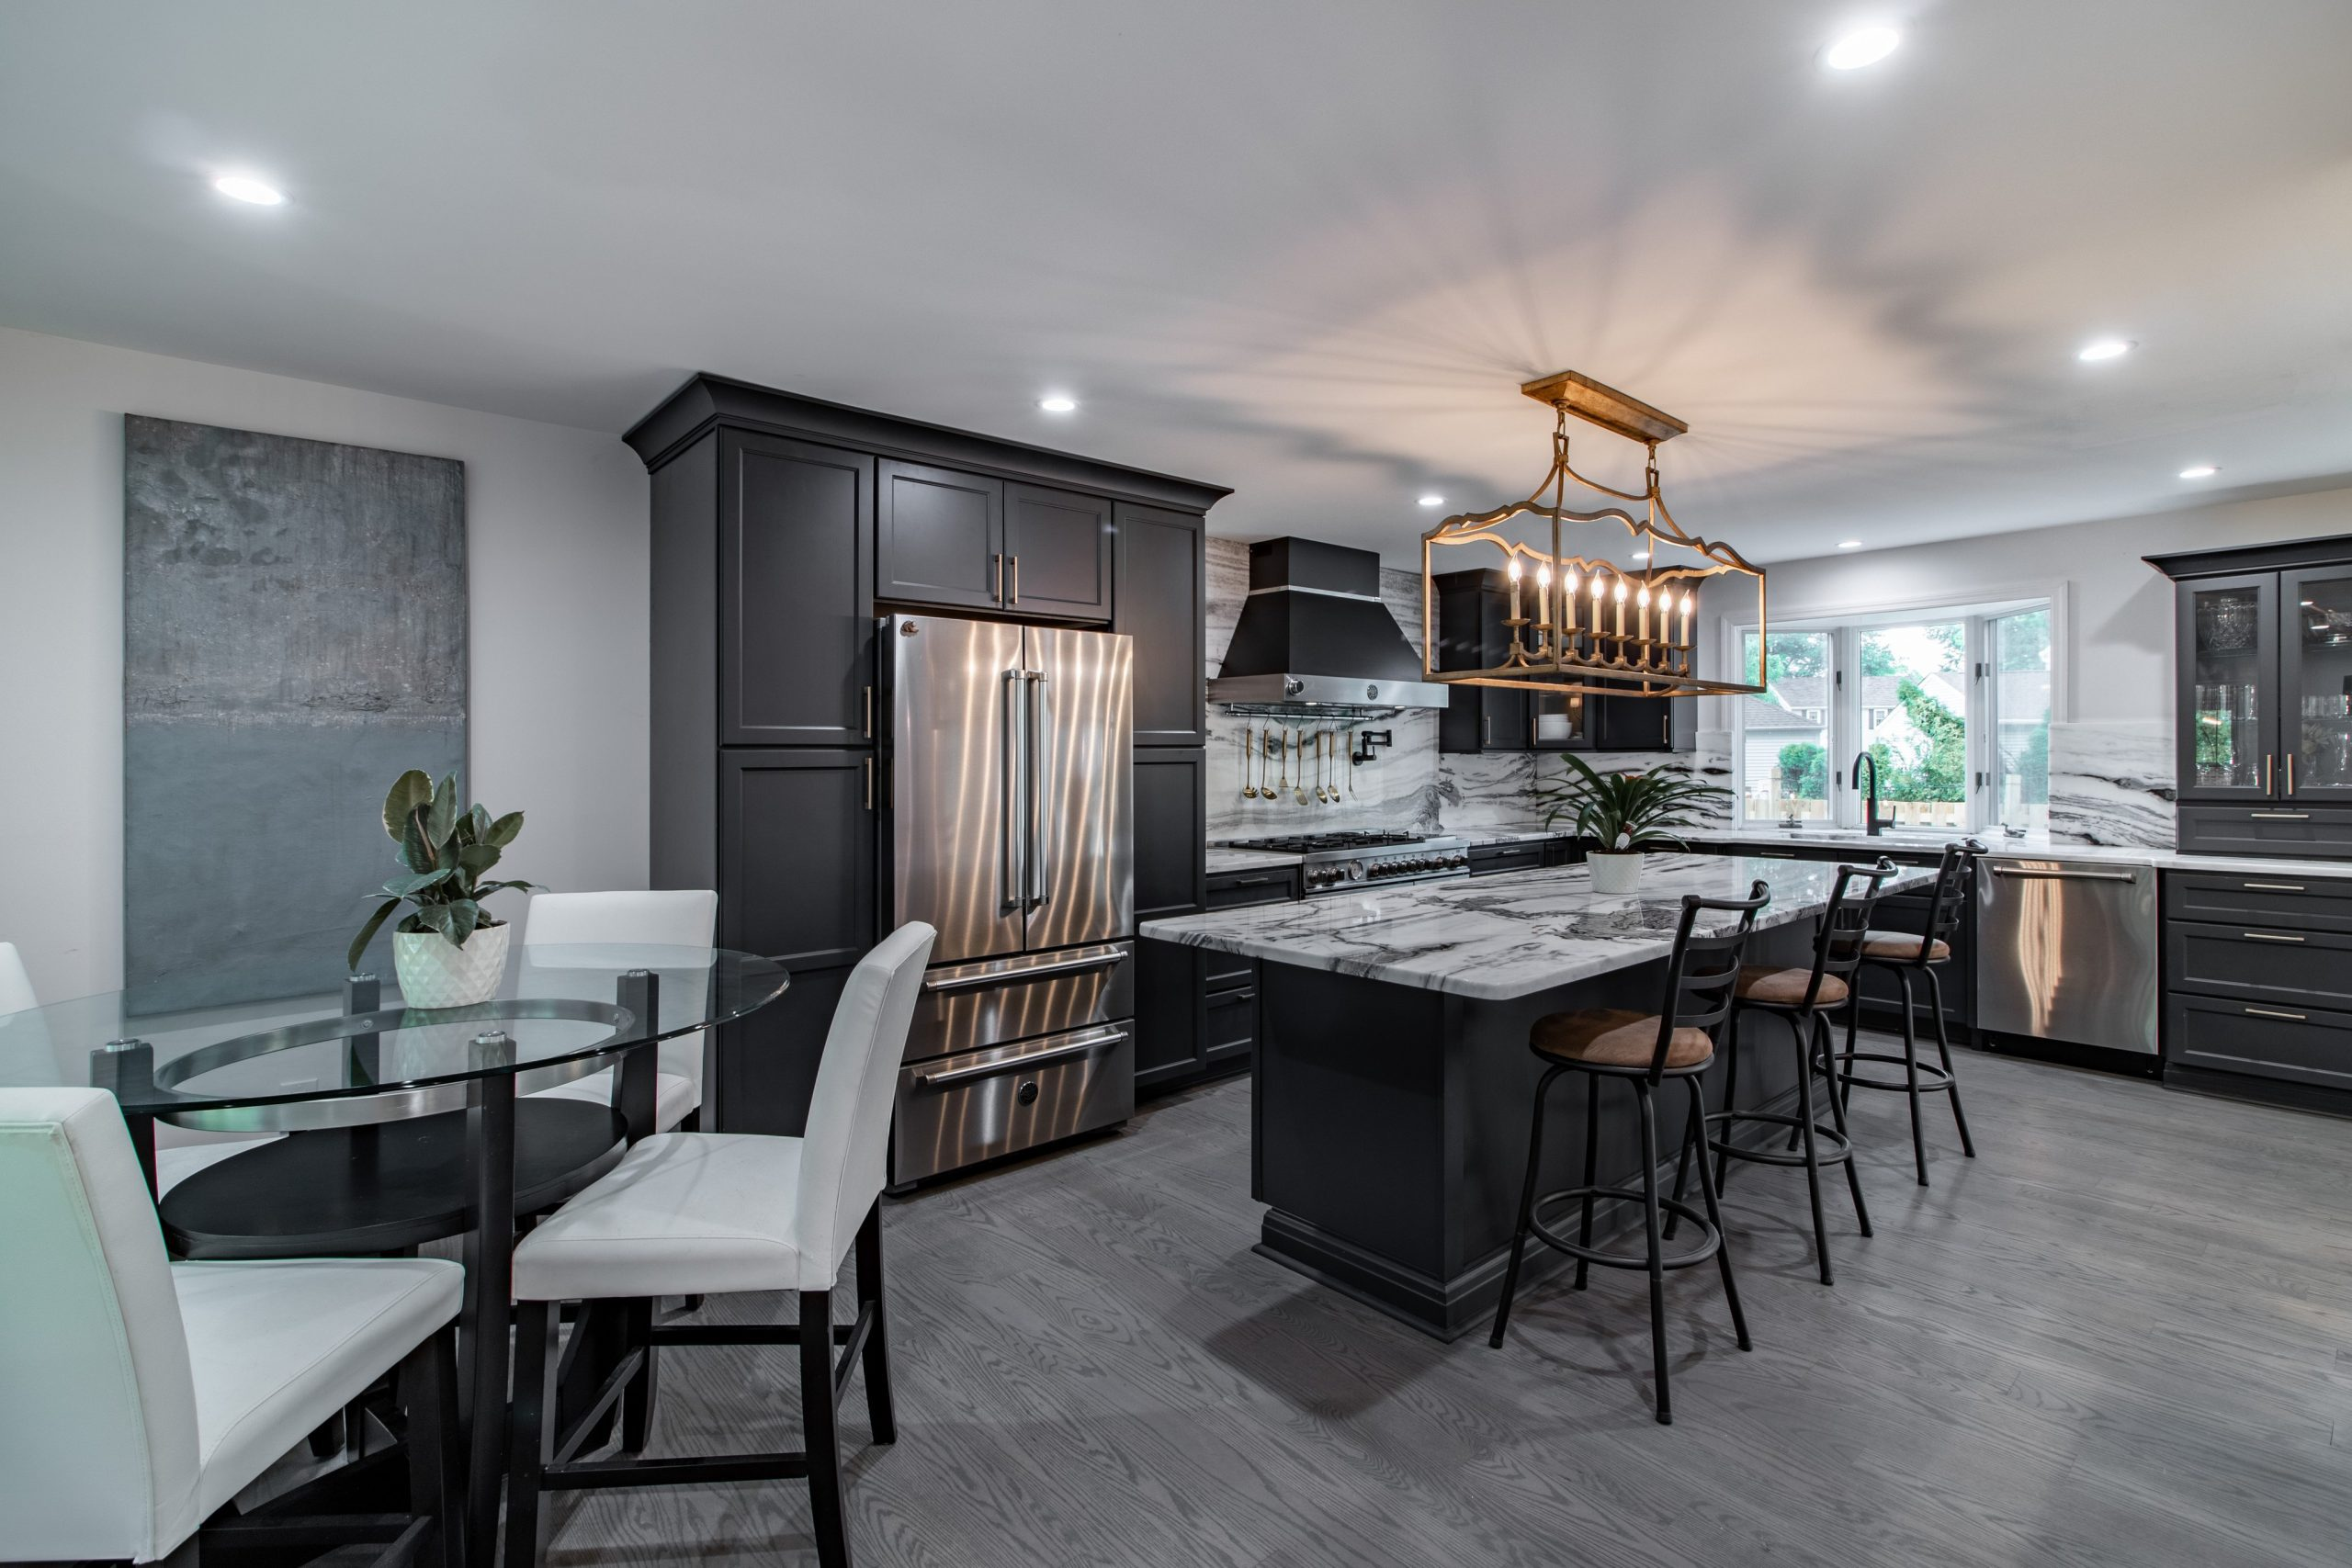 Black Kitchen - Cheap Cabinets